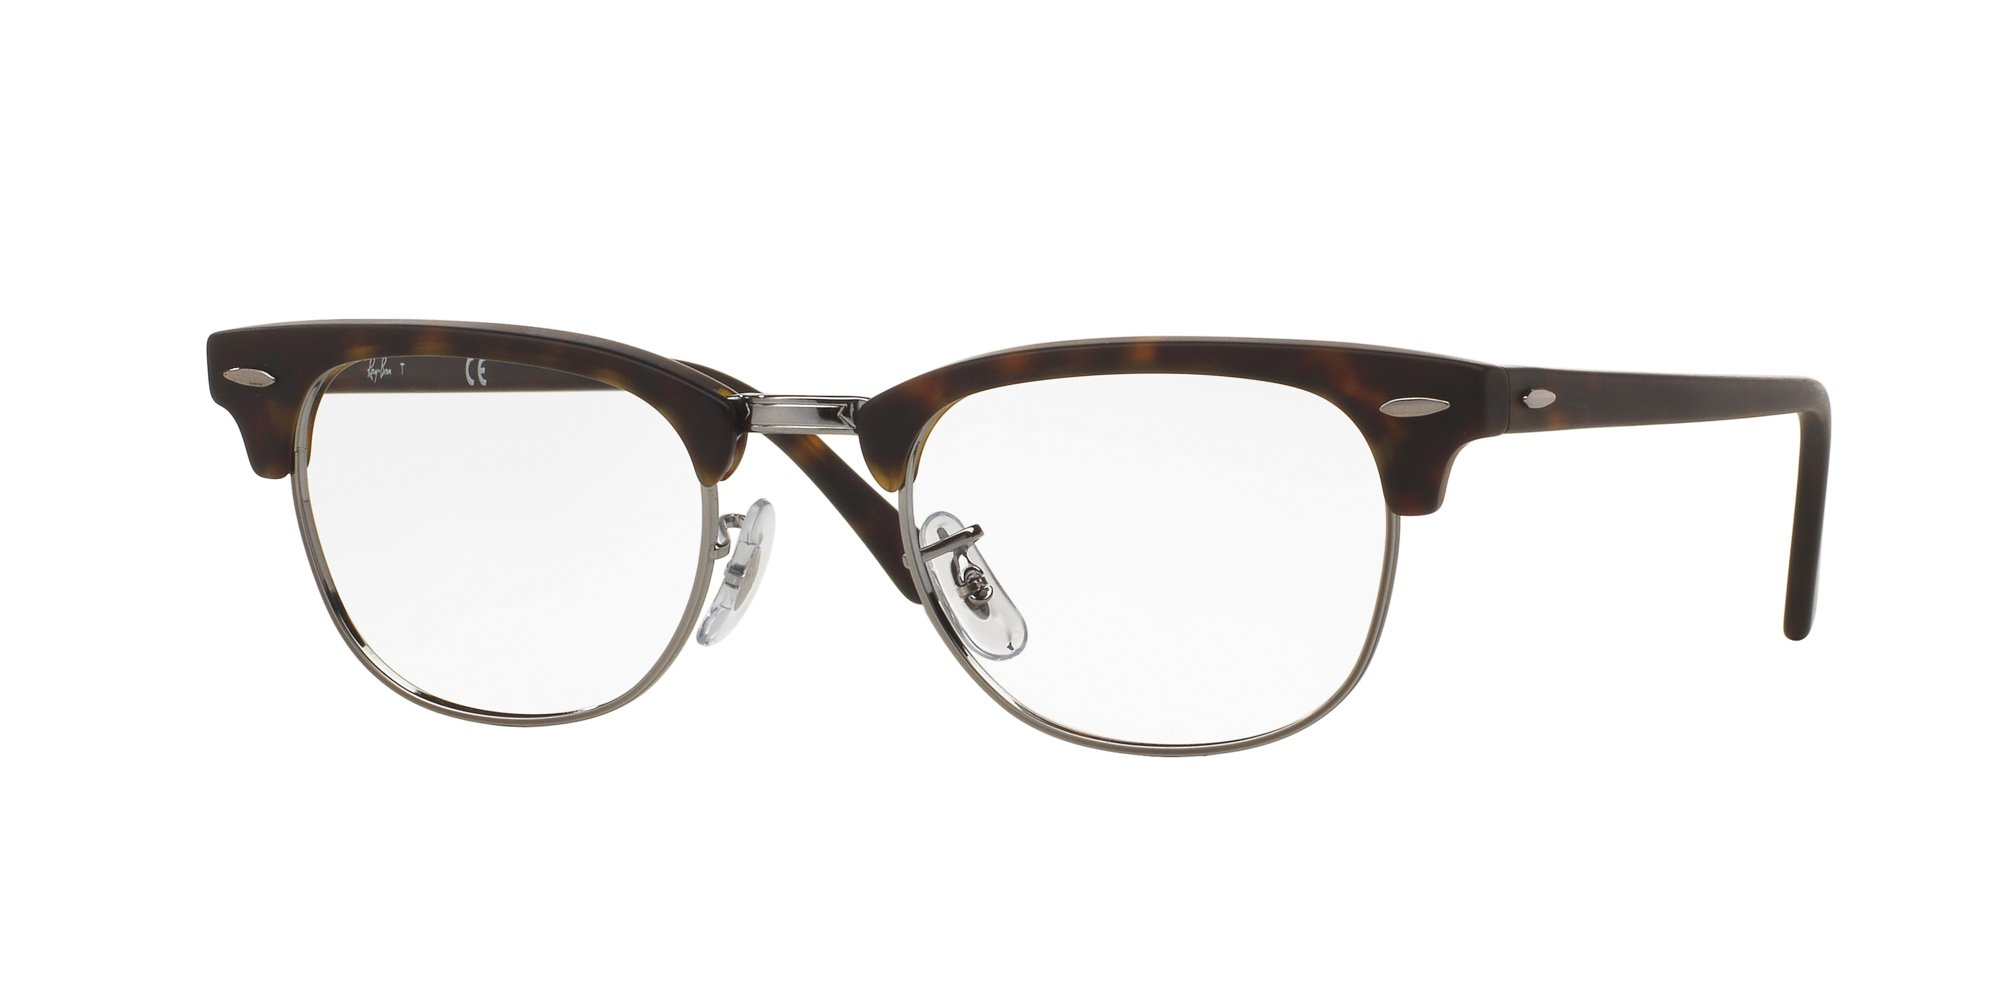 Ray-Ban Unisex RX5154 Clubmaster Eyeglasses Matte Dark Havana 49mm